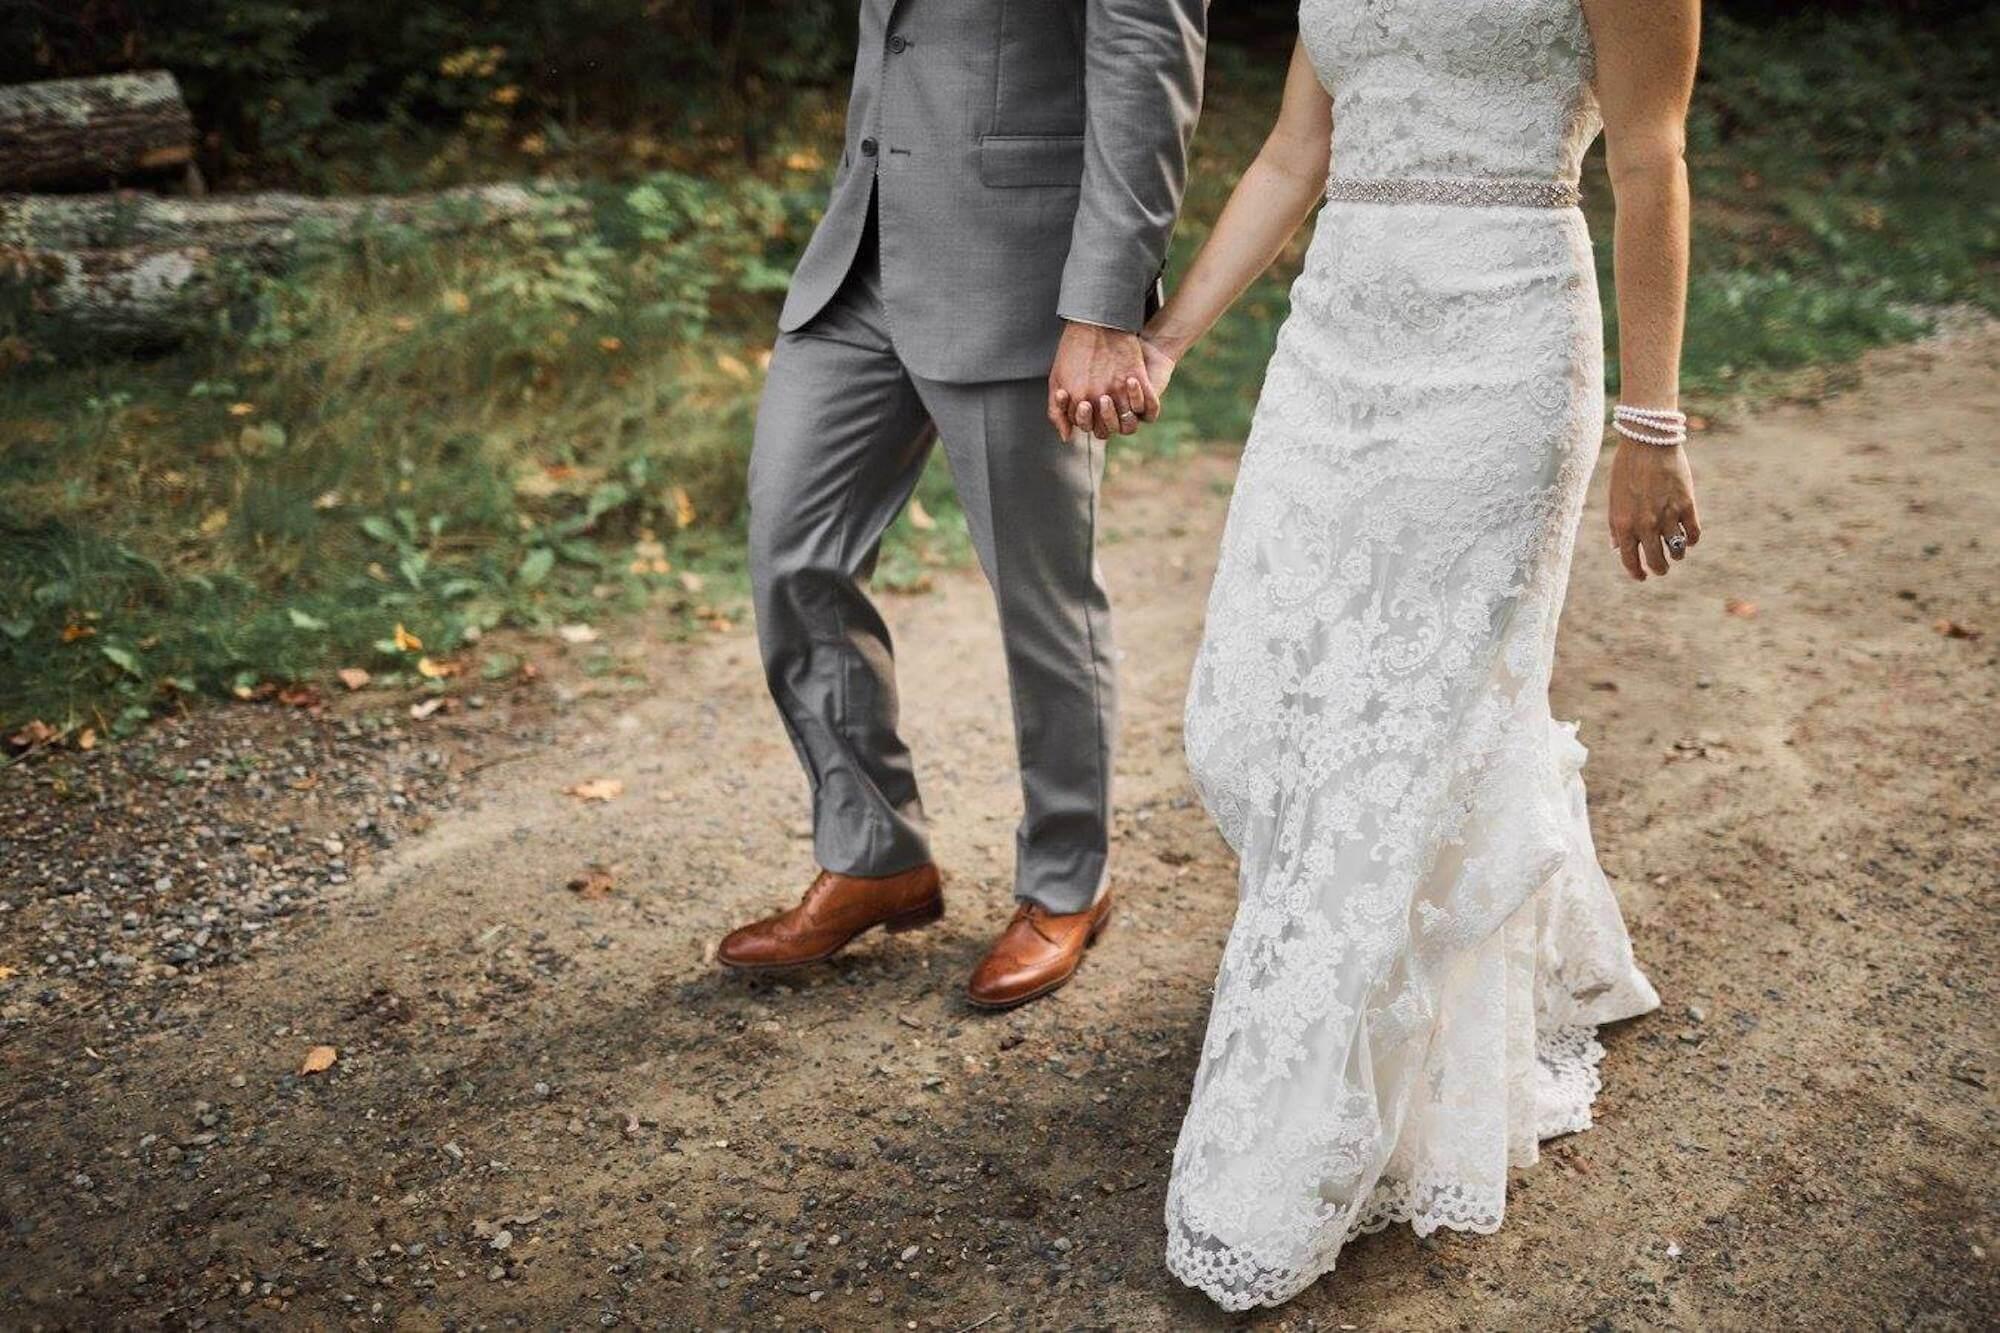 engle-olson-wedding-video-perry-james-photography-10.jpg